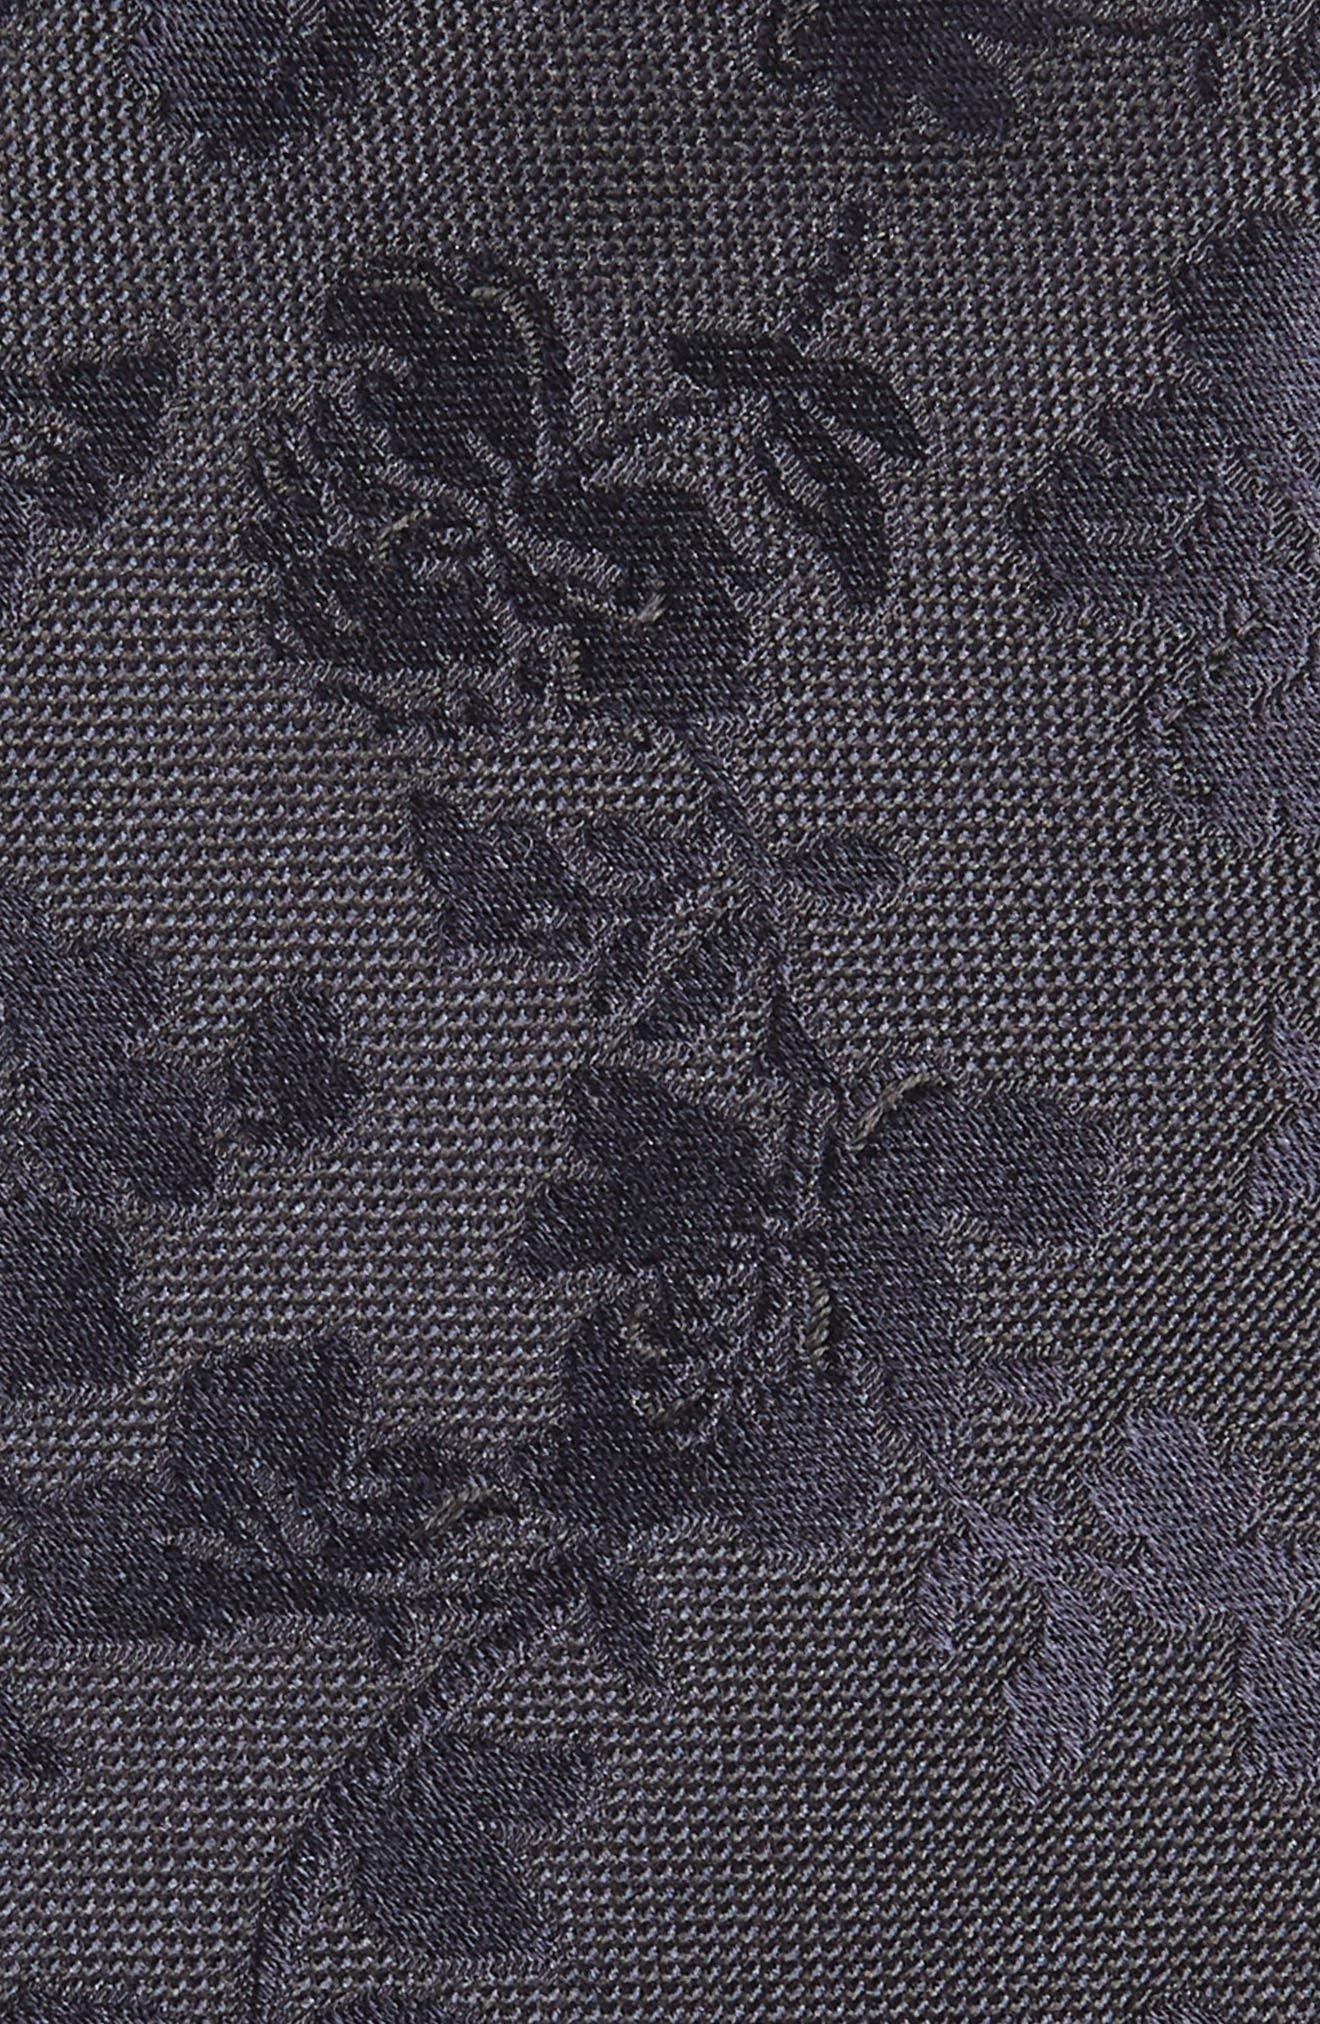 Tonal Floral Silk Tie,                             Alternate thumbnail 2, color,                             415